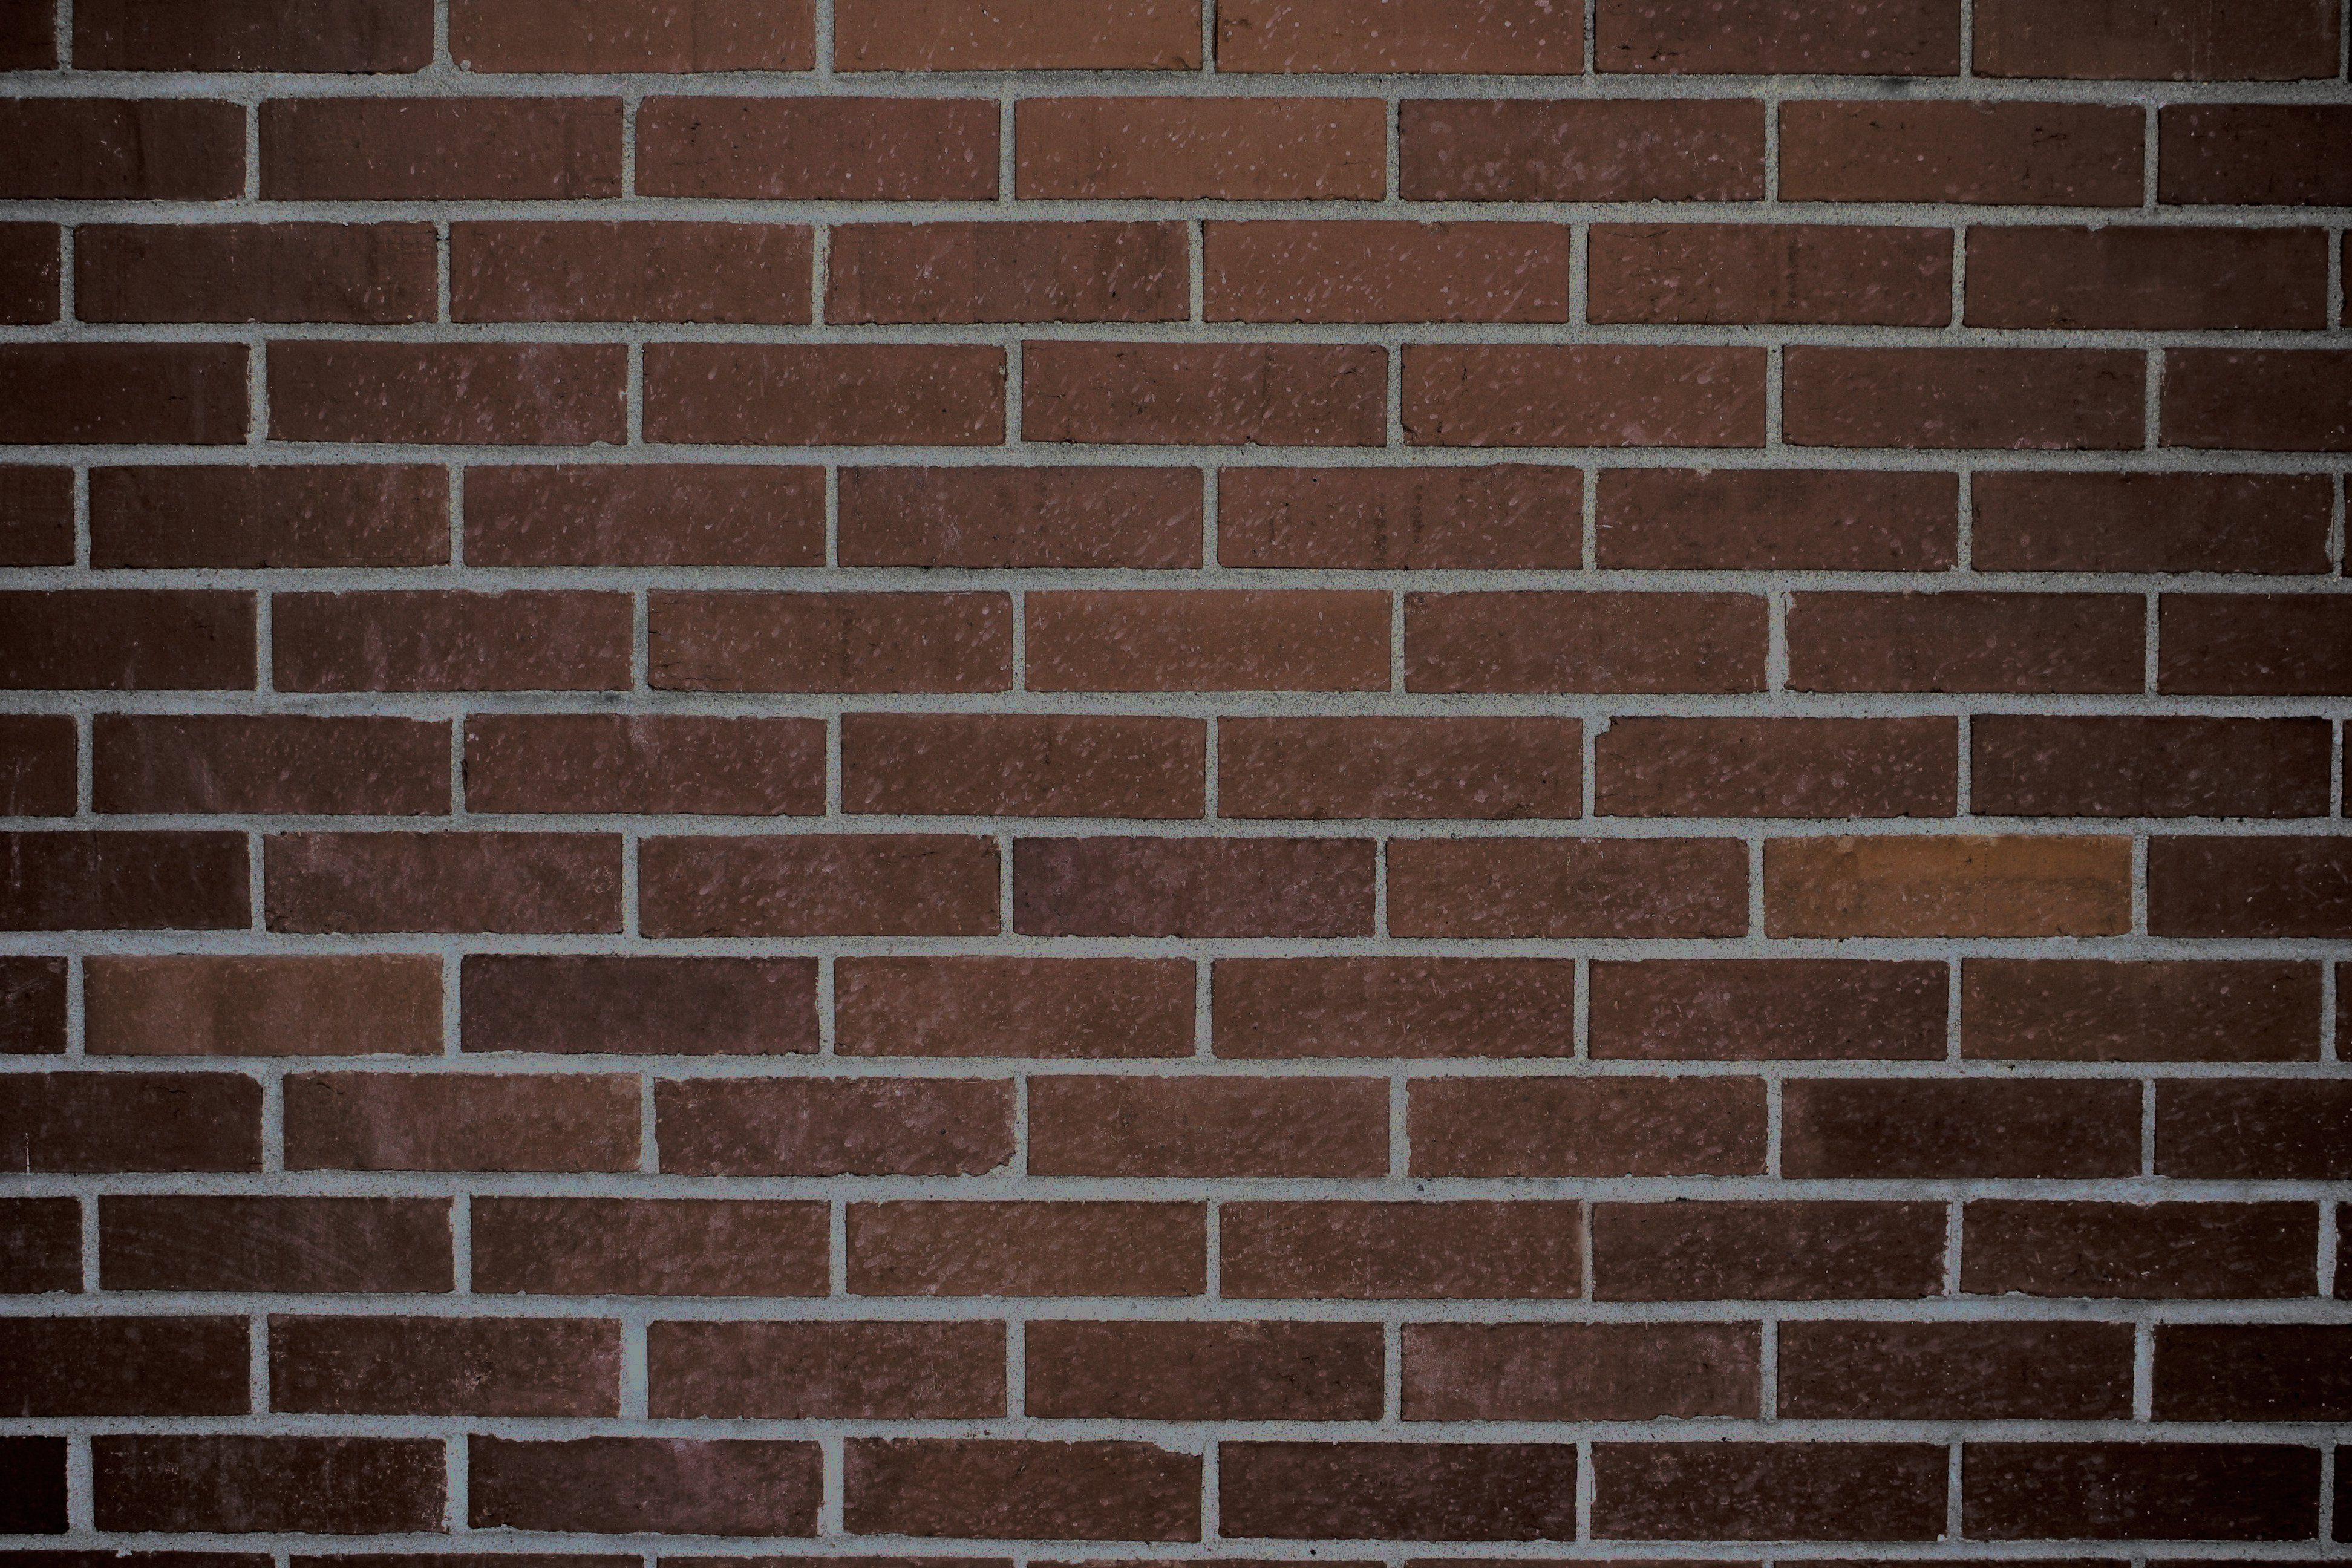 Dark Brown Brick Wall Texture.